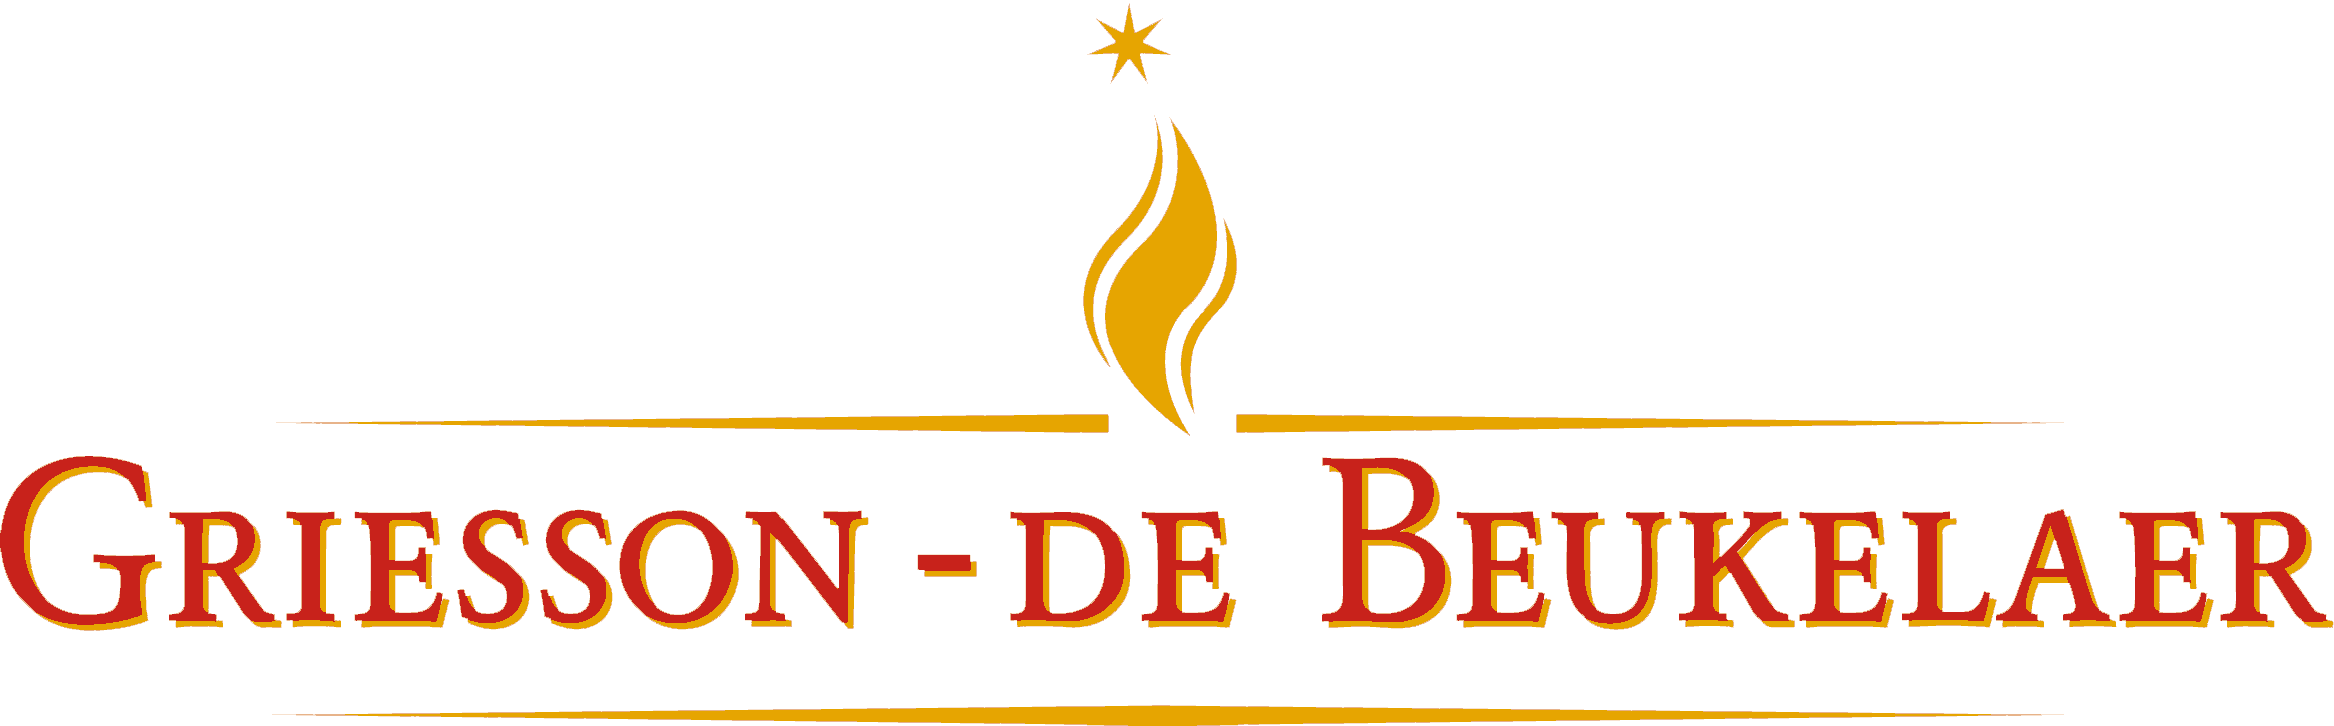 Griesson - de Beukelaer GmbH & Co. KG Logo